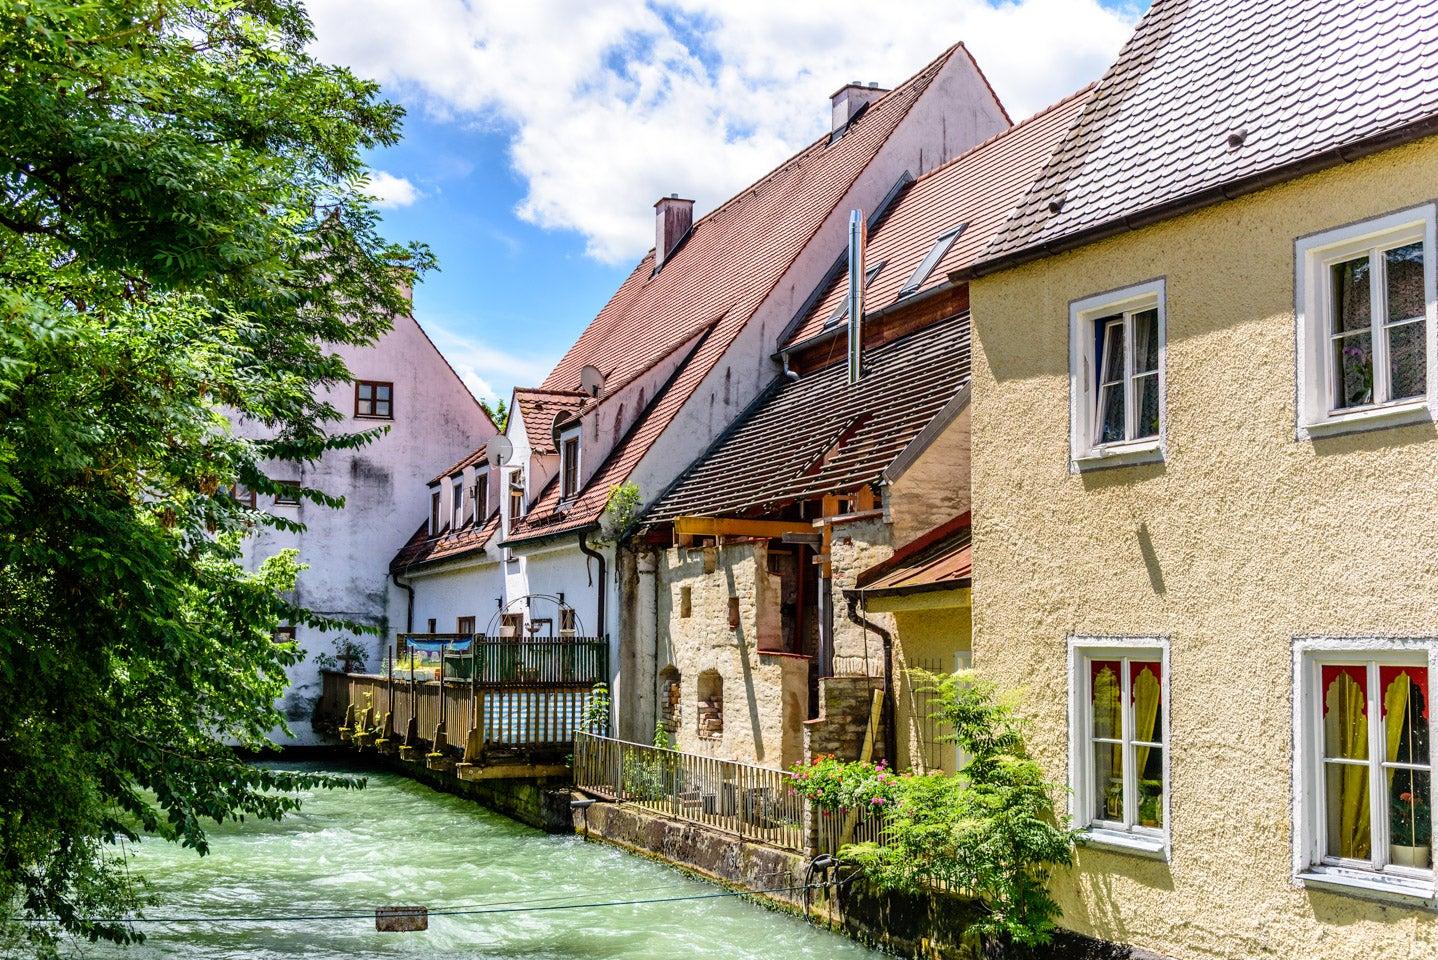 URでアパート契約 | 雨にも負けず | ドイツ留学専門店 Pfadfinder24